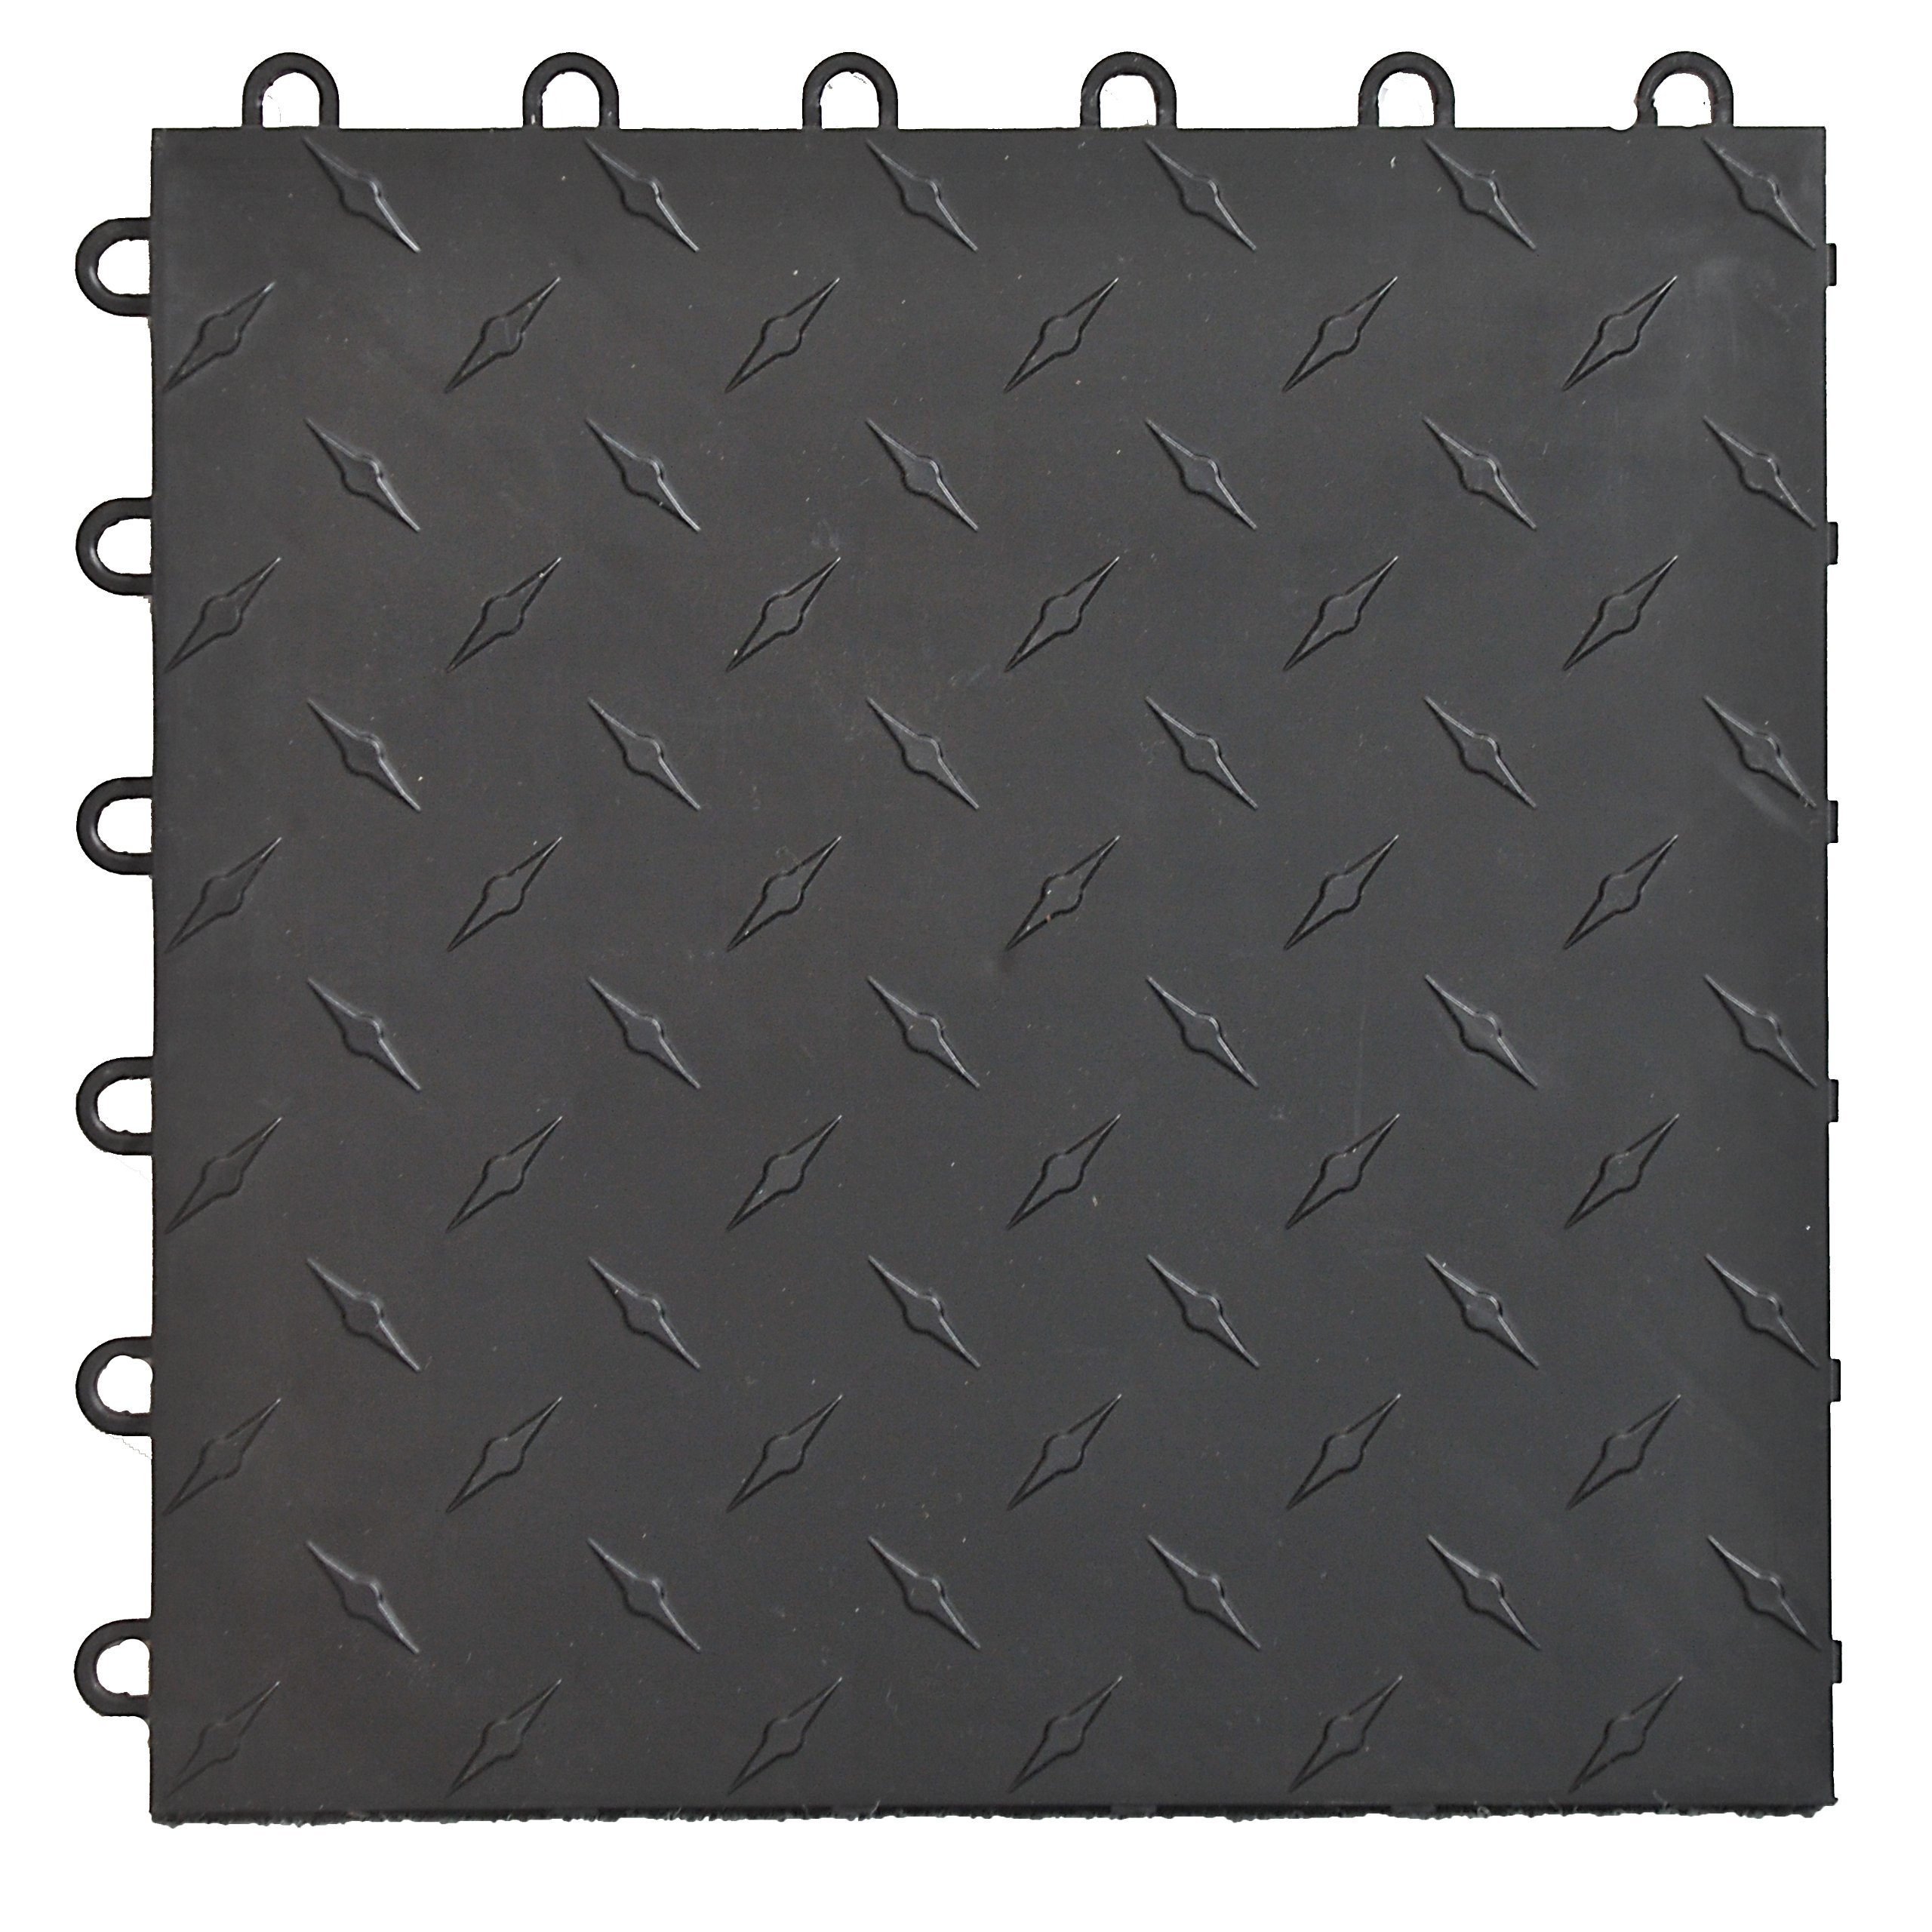 Speedway 789453B-50 Diamond Garage Floor 6 LOCK Diamond Tile 50 Pack, Black (Renewed)